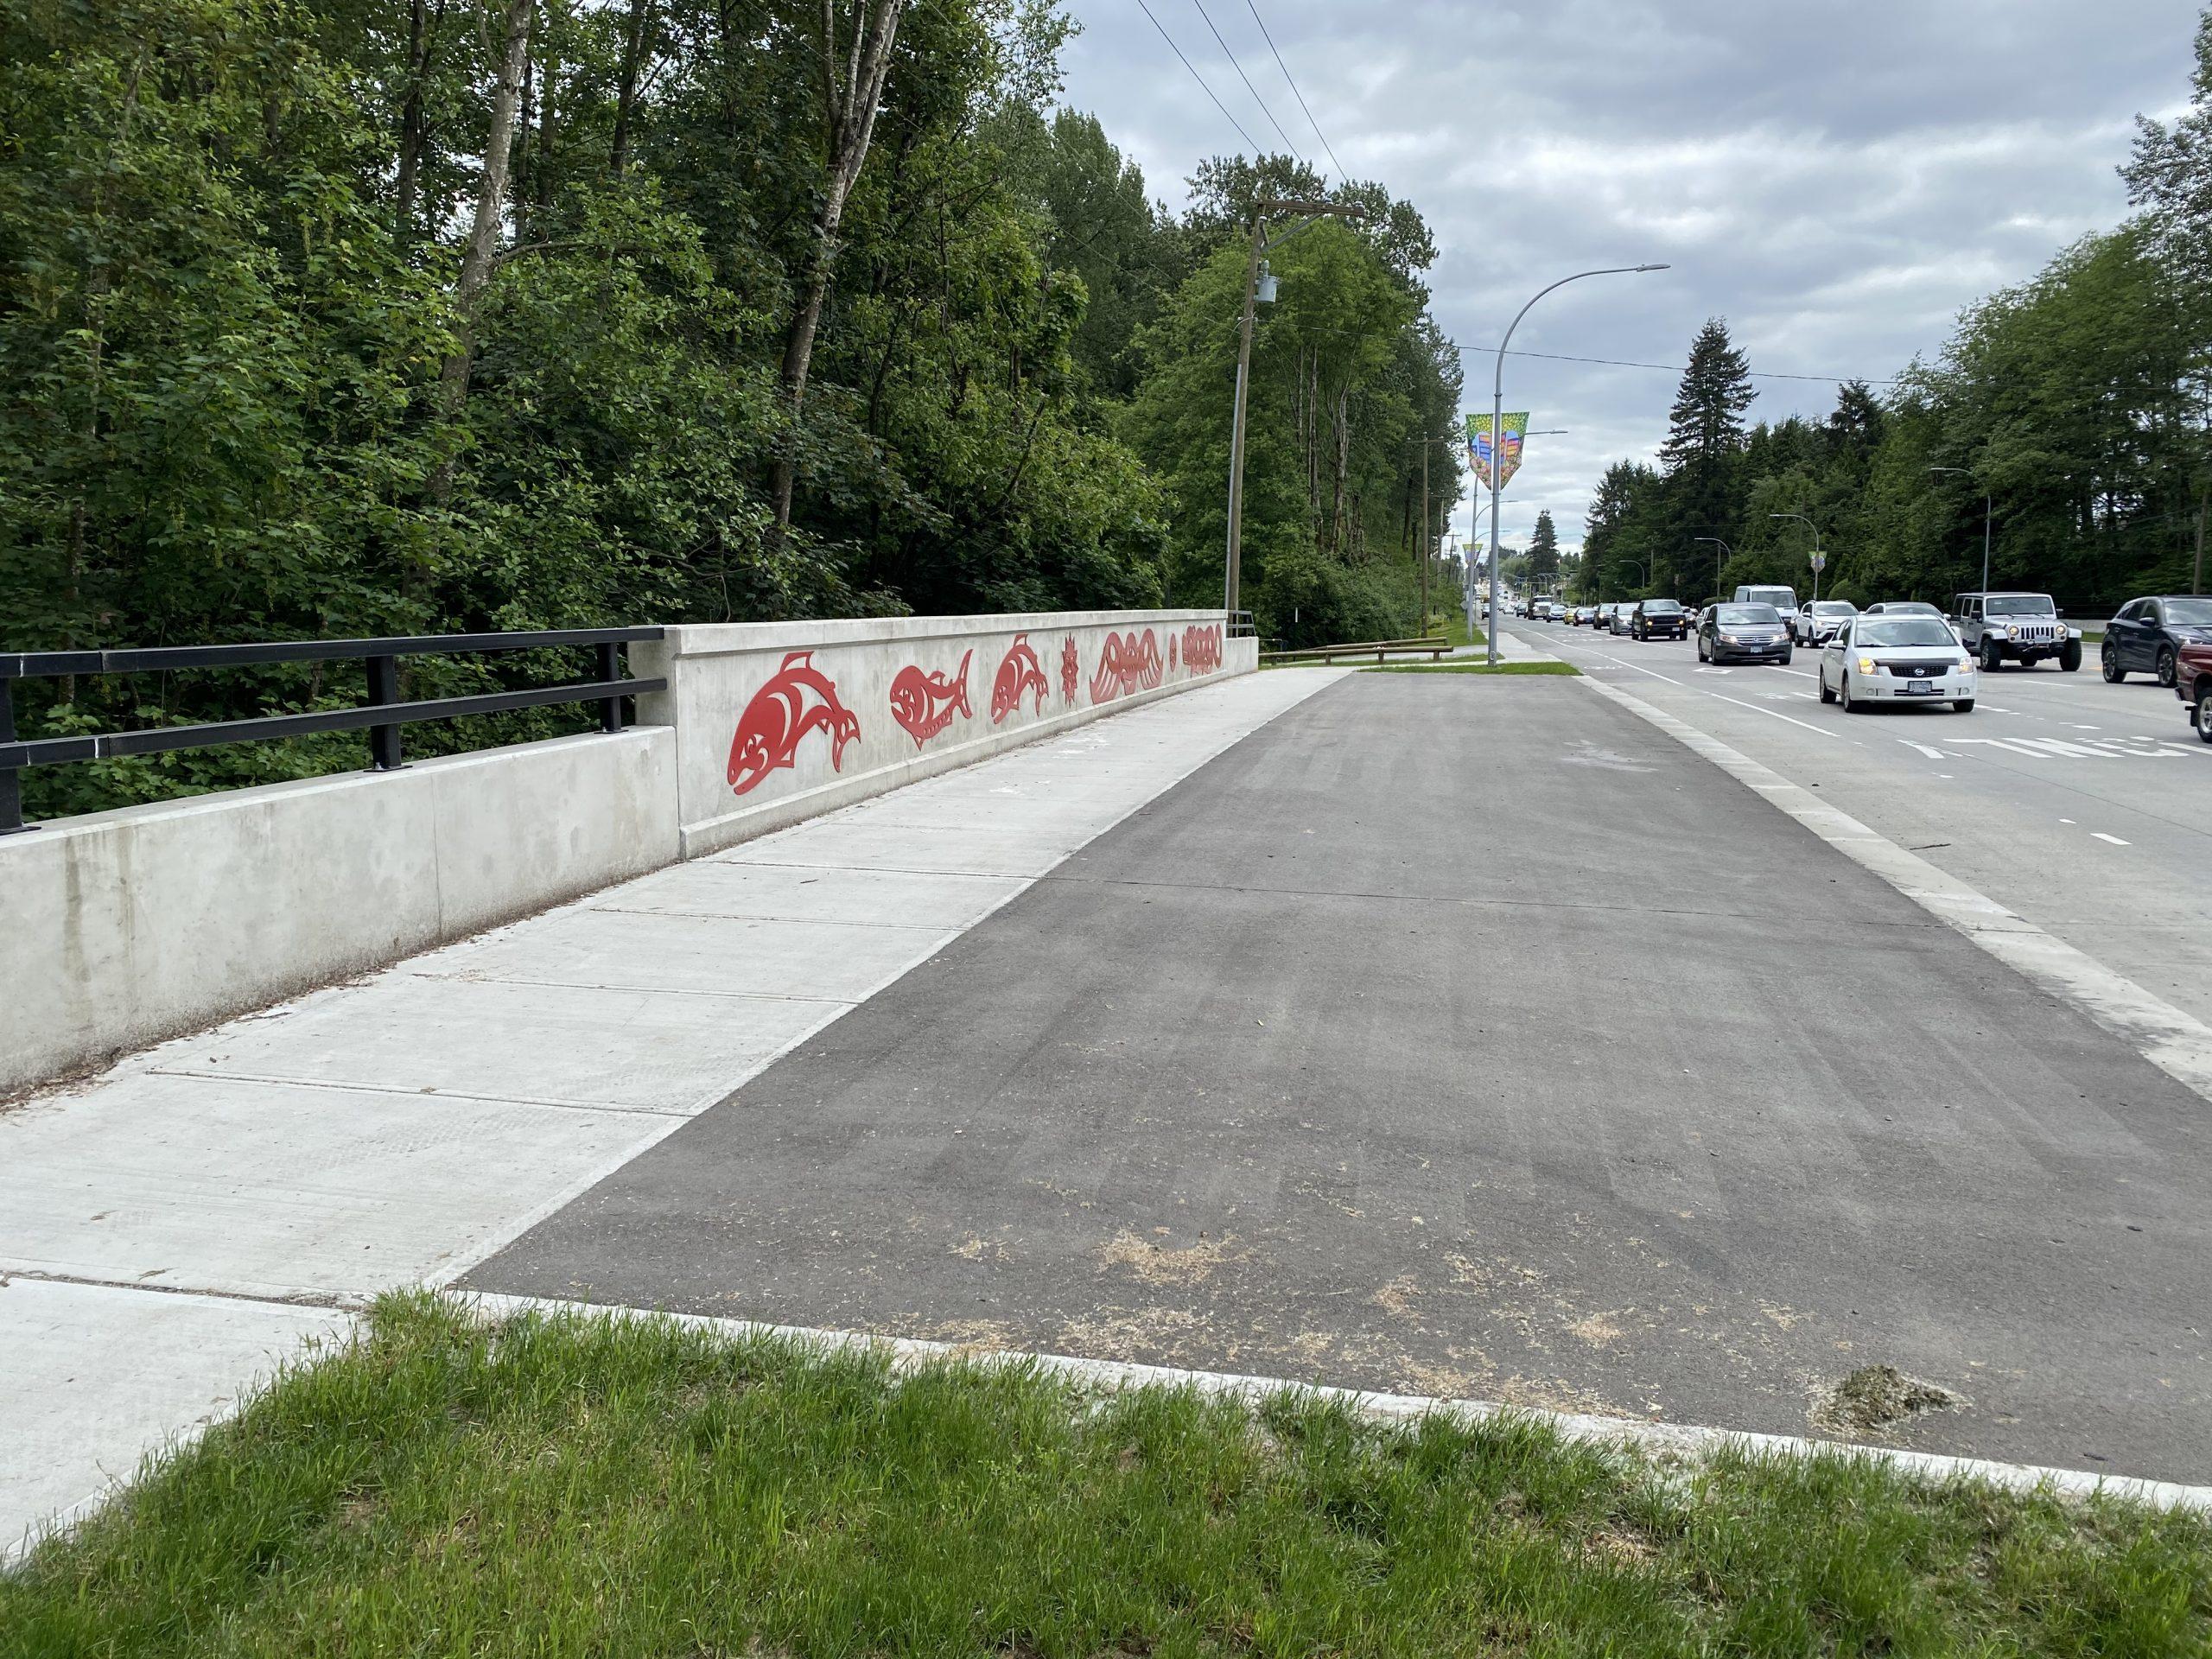 Bear Creek Bridge Project